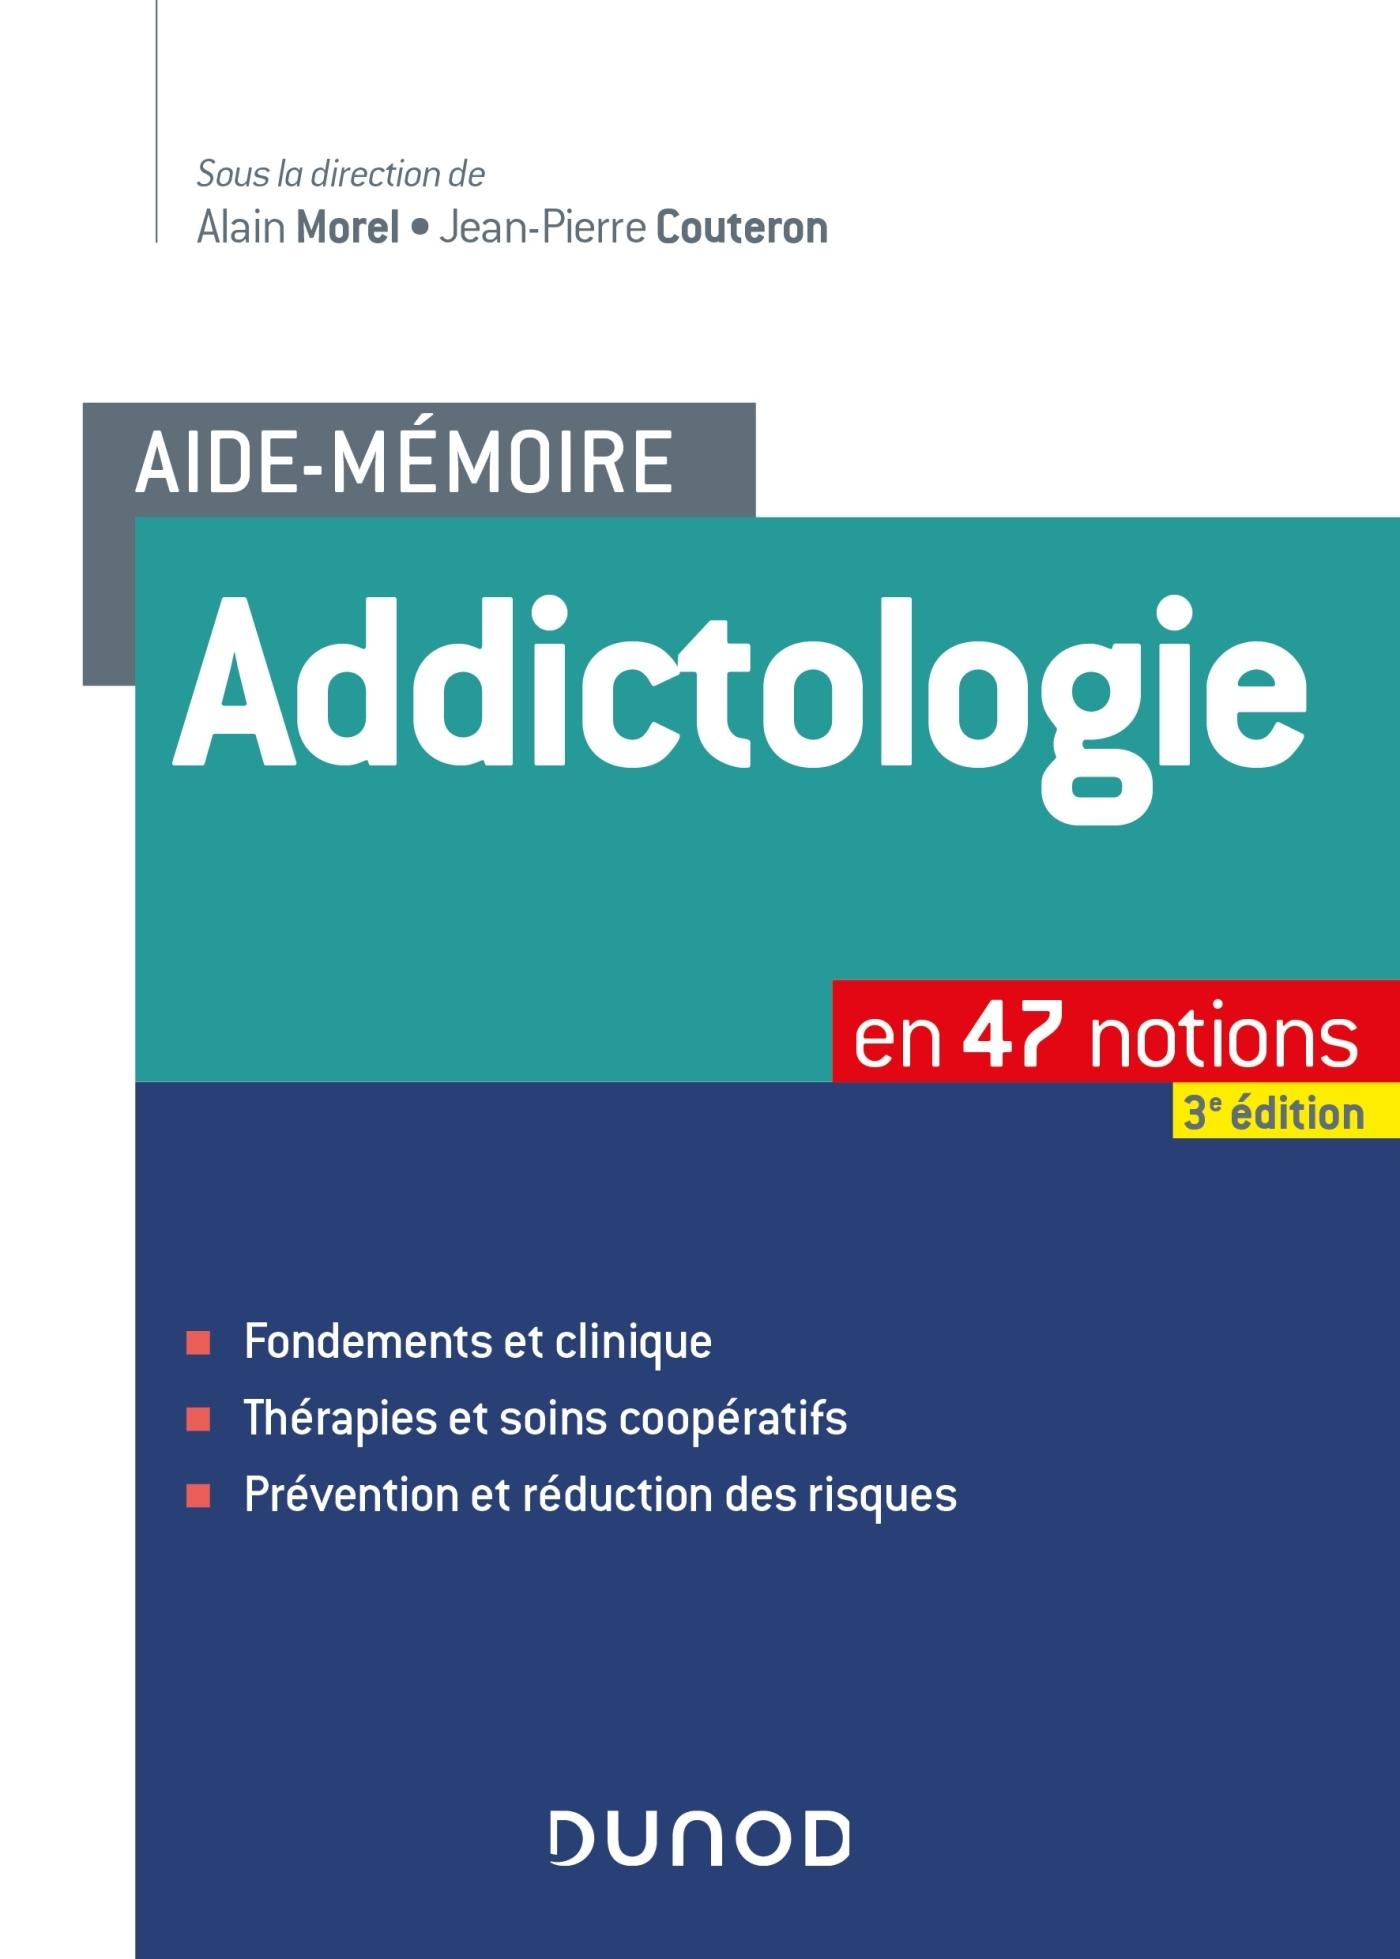 AIDE-MEMOIRE - ADDICTOLOGIE - EN 47 NOTIONS